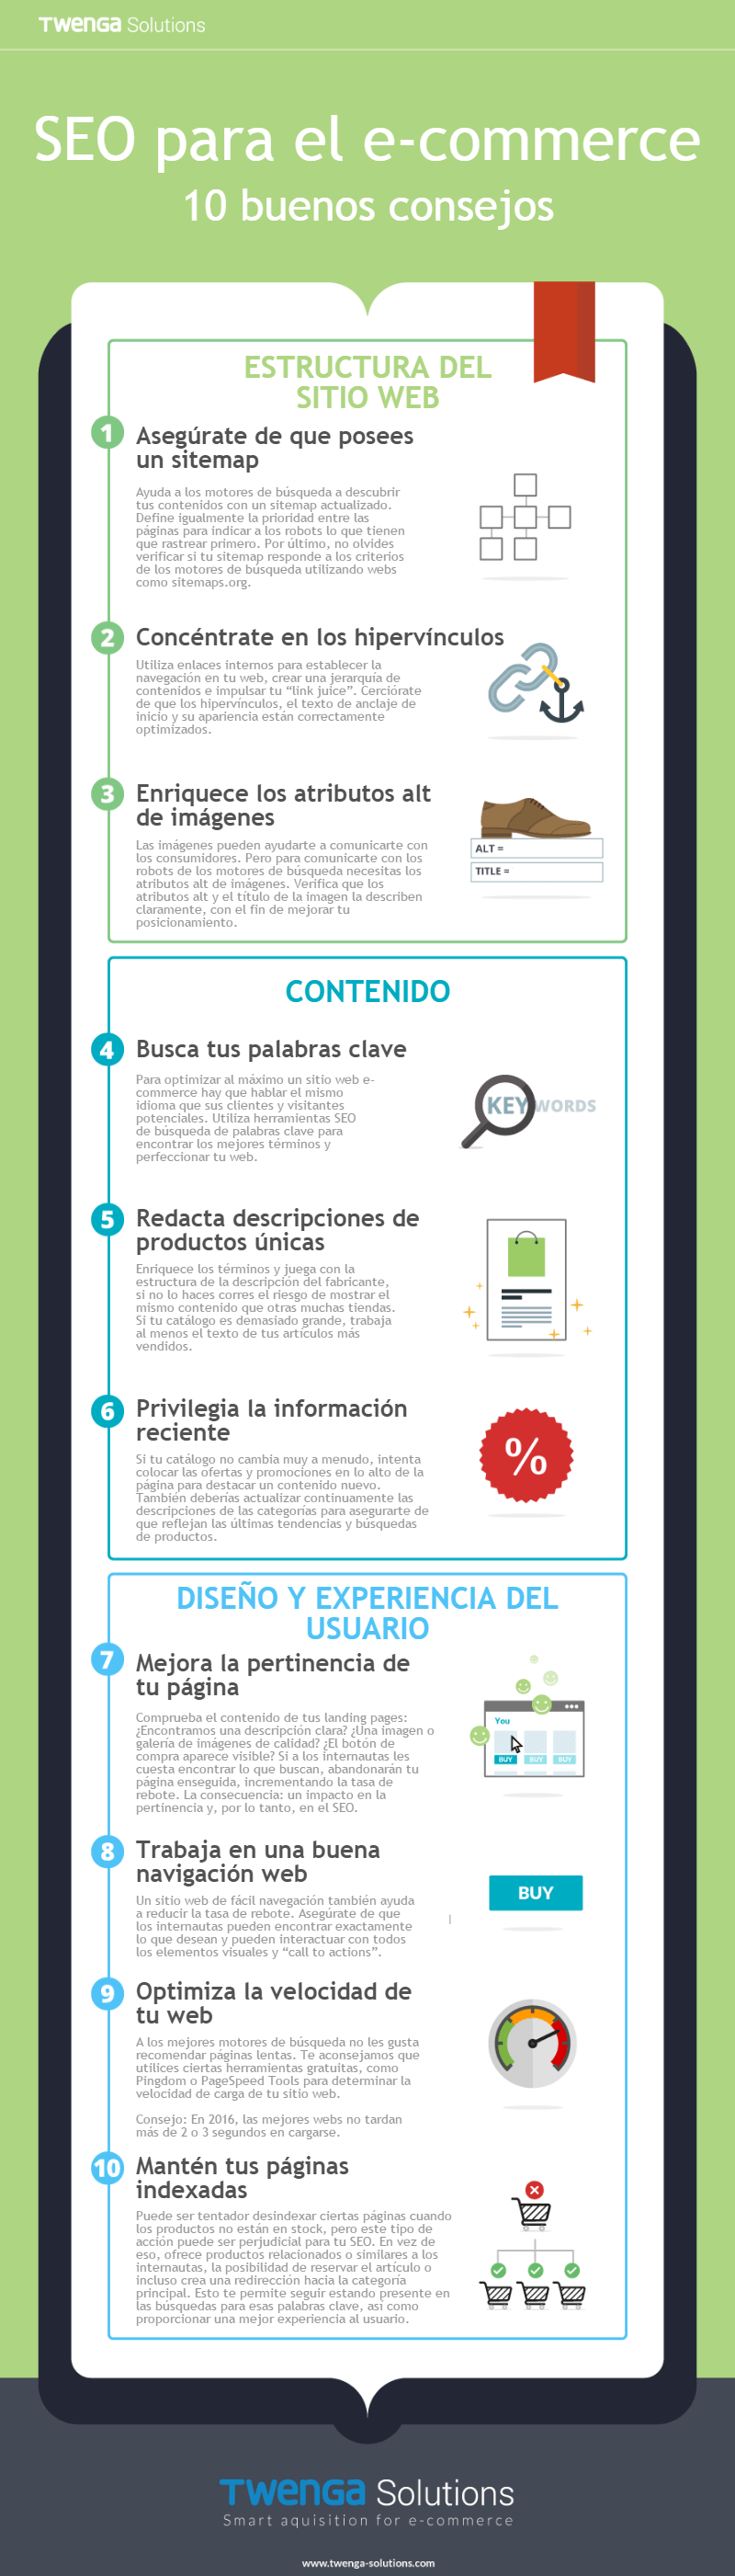 infografia-optimizacion-seo-ecommerce